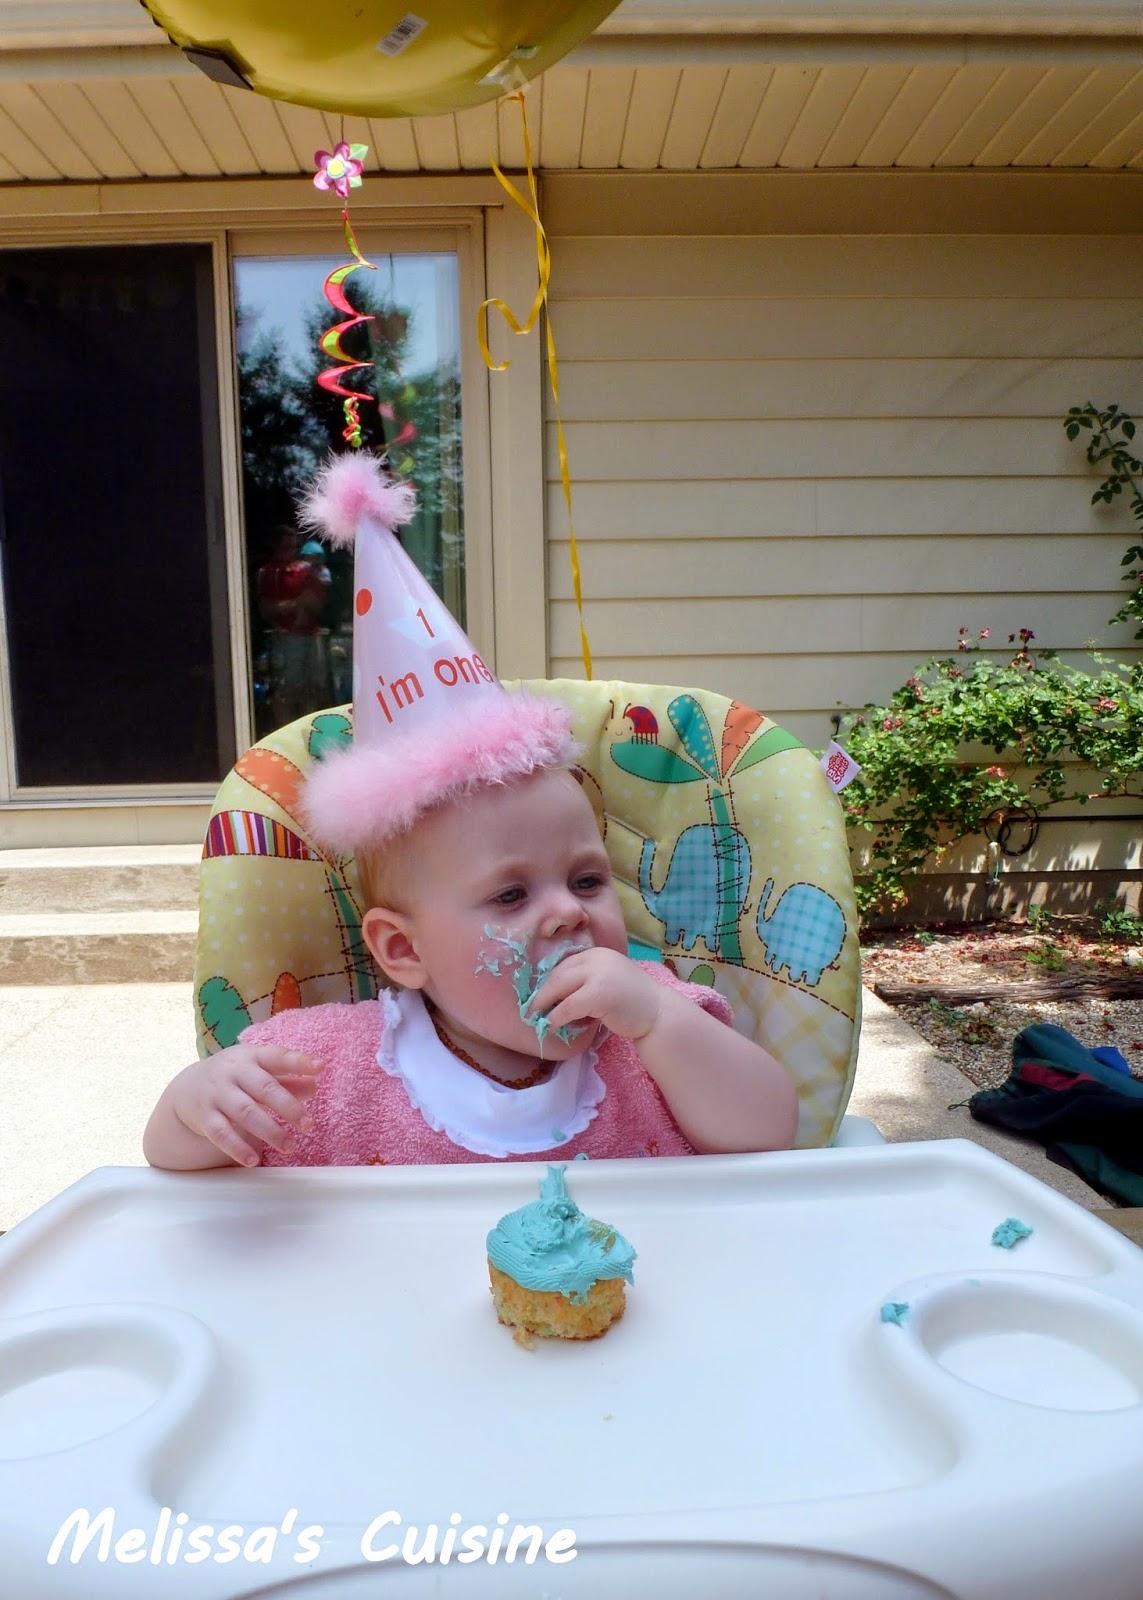 Melissa's Cuisine: Funfetti Cupcakes